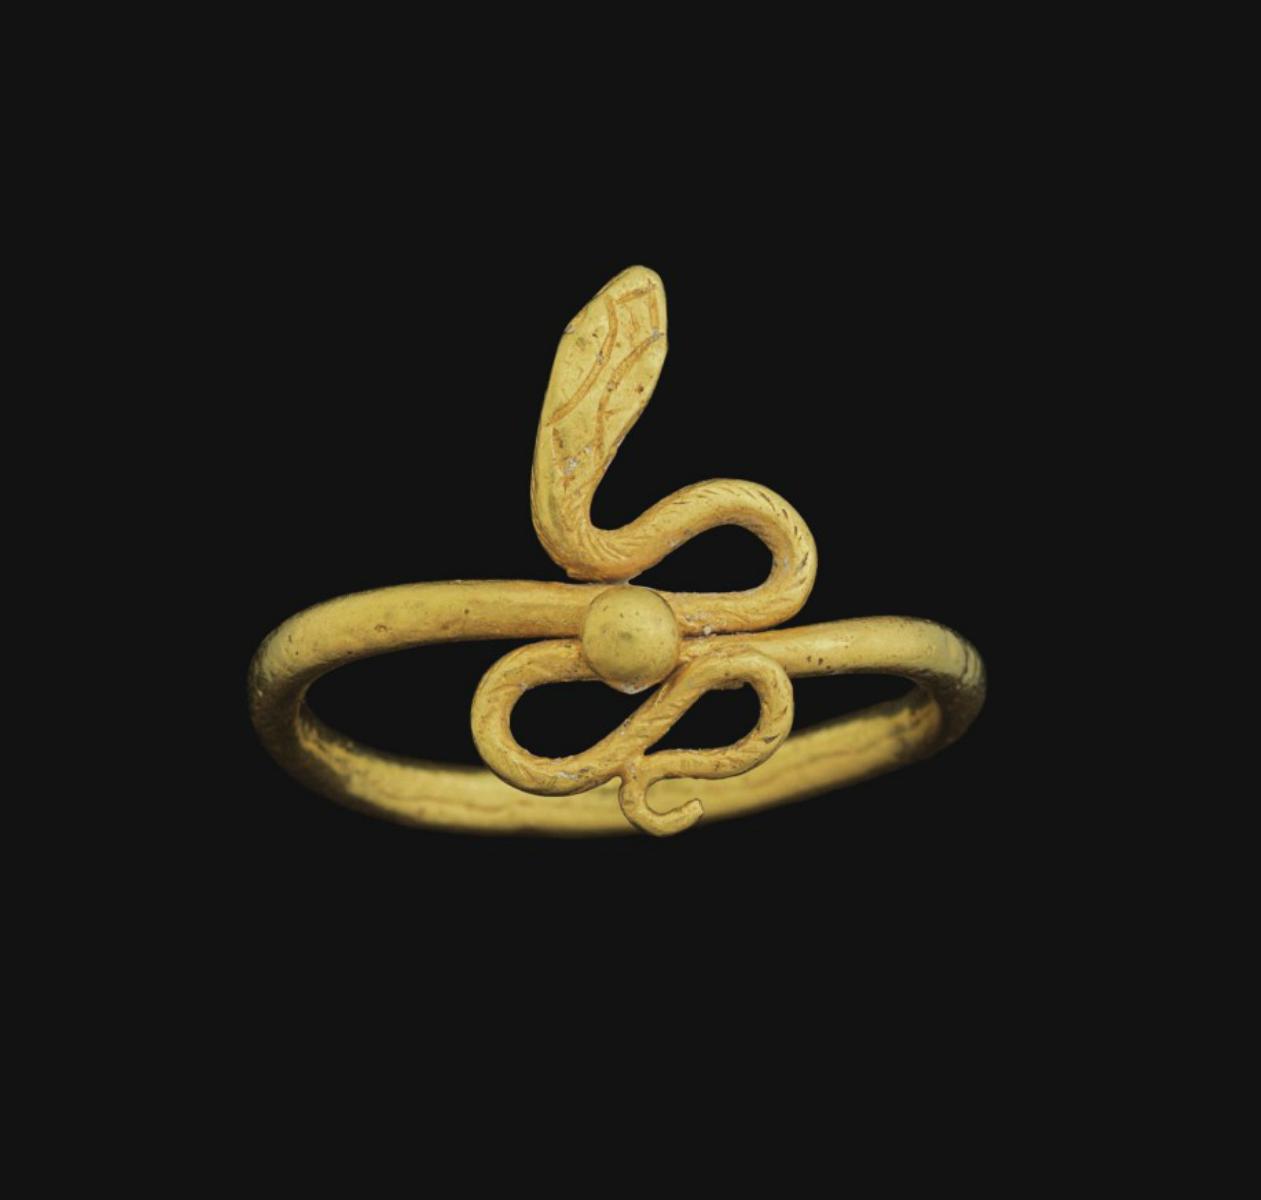 Древние украшения в виде змеи фото